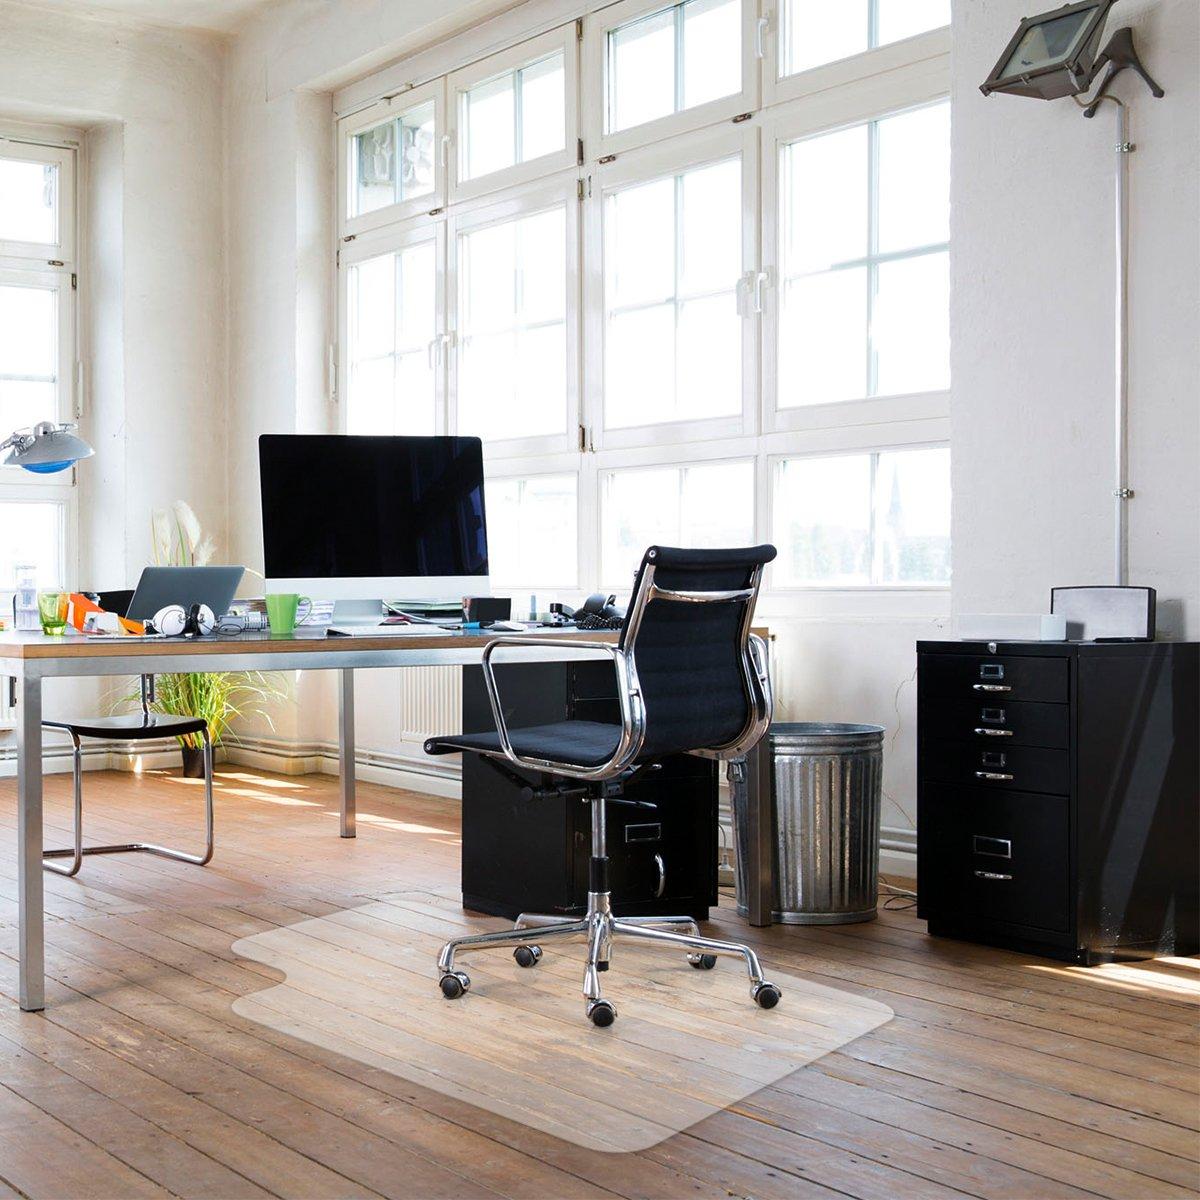 Get Quotations Sy Desk Chair Mat For Hardwood Floors Transpa Non Slip Premium Quality Floor 36